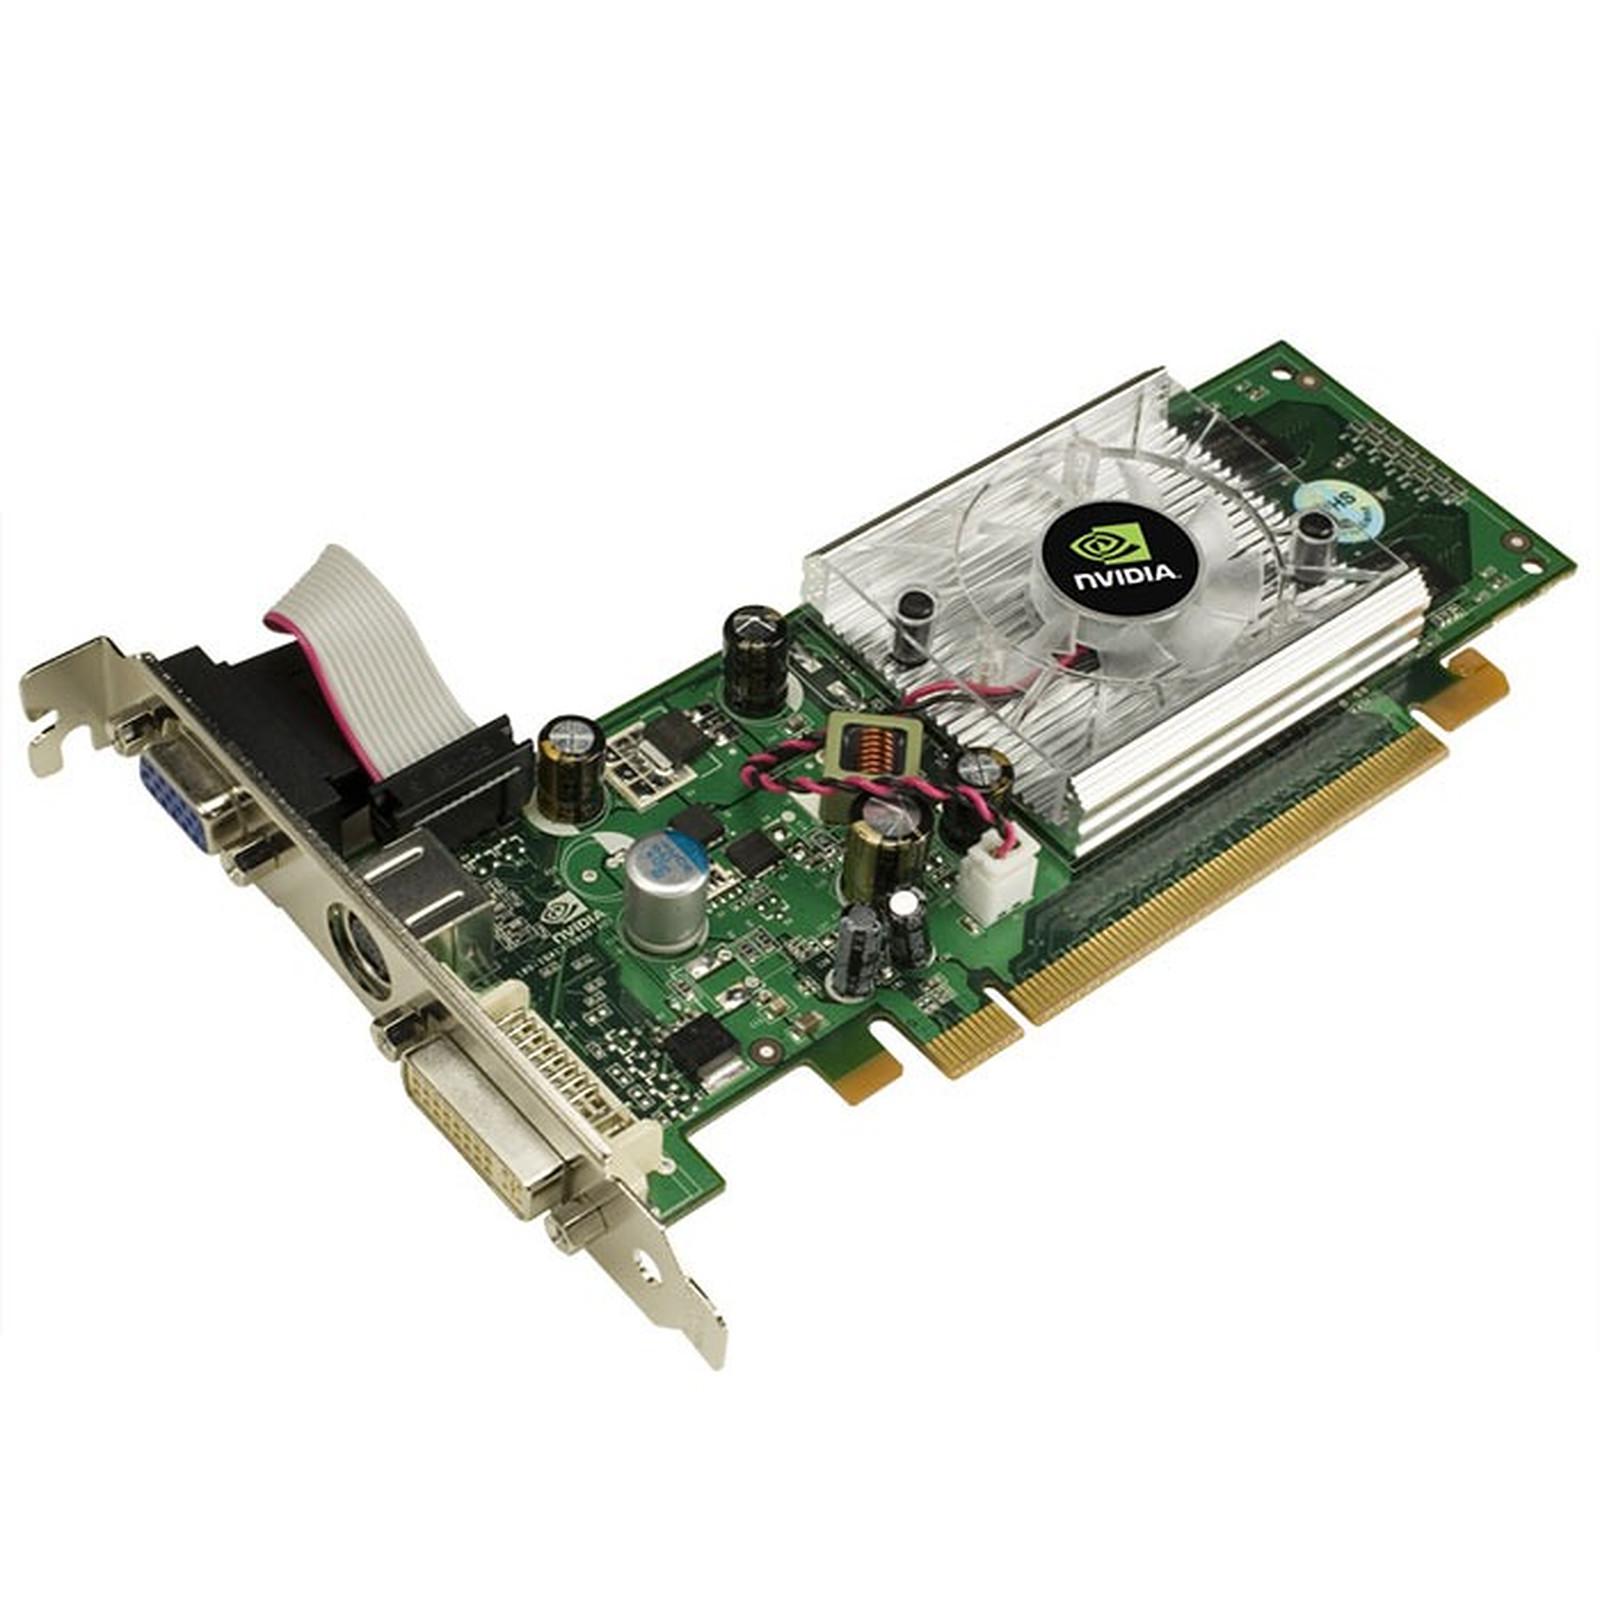 NVIDIA GeForce 8400 GS